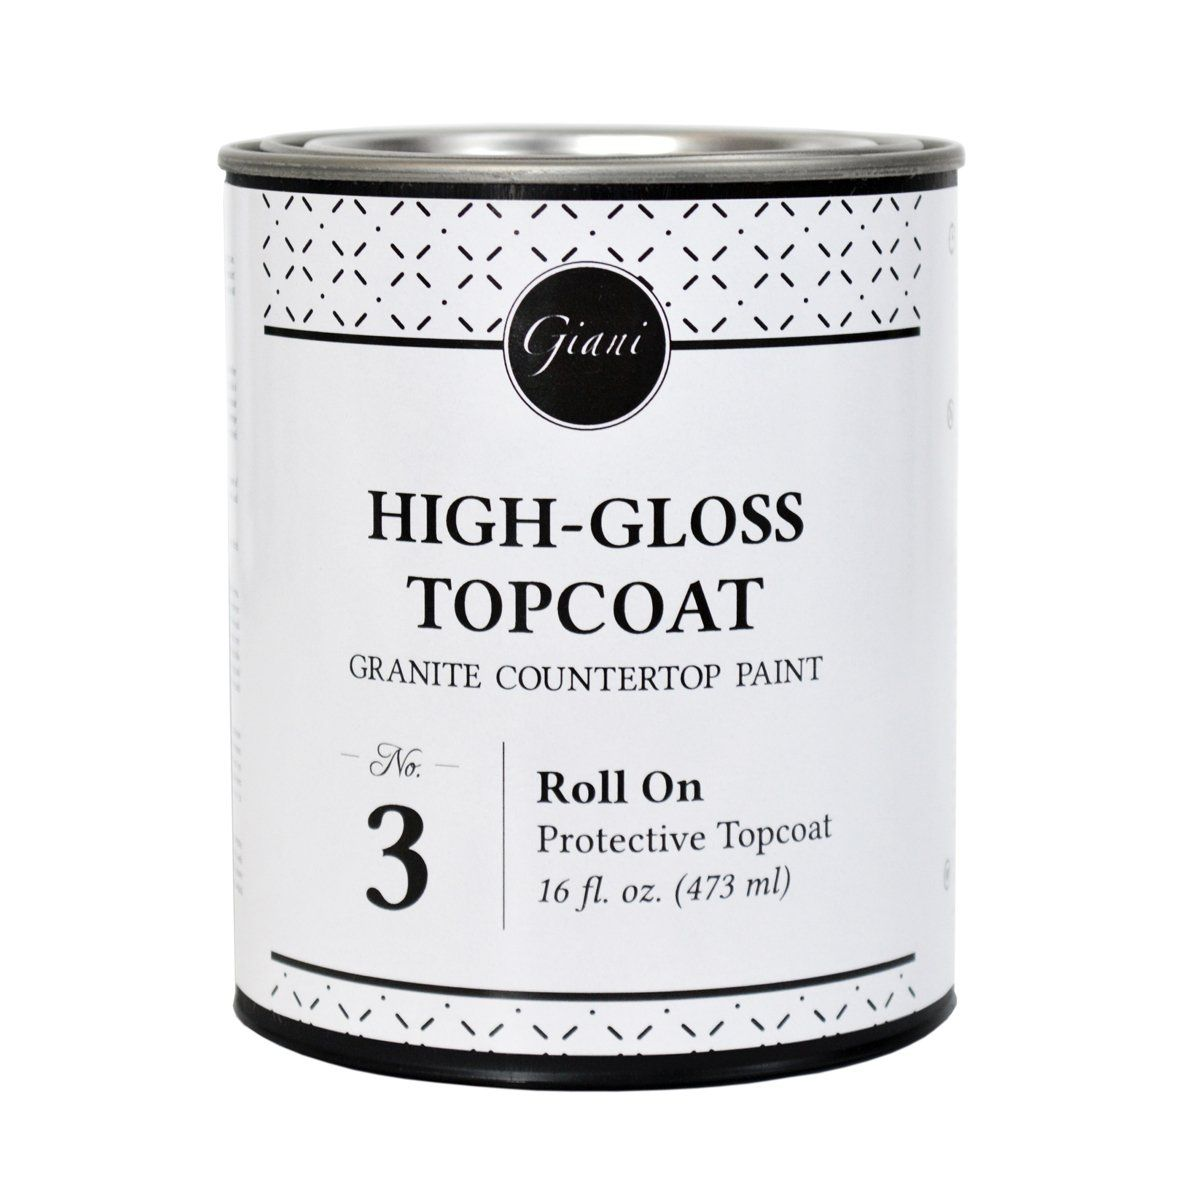 High Gloss Topcoat For Giani Countertop Paint Kits Step 3 Giani Countertop Paint Painting Countertops Countertop Paint Kit